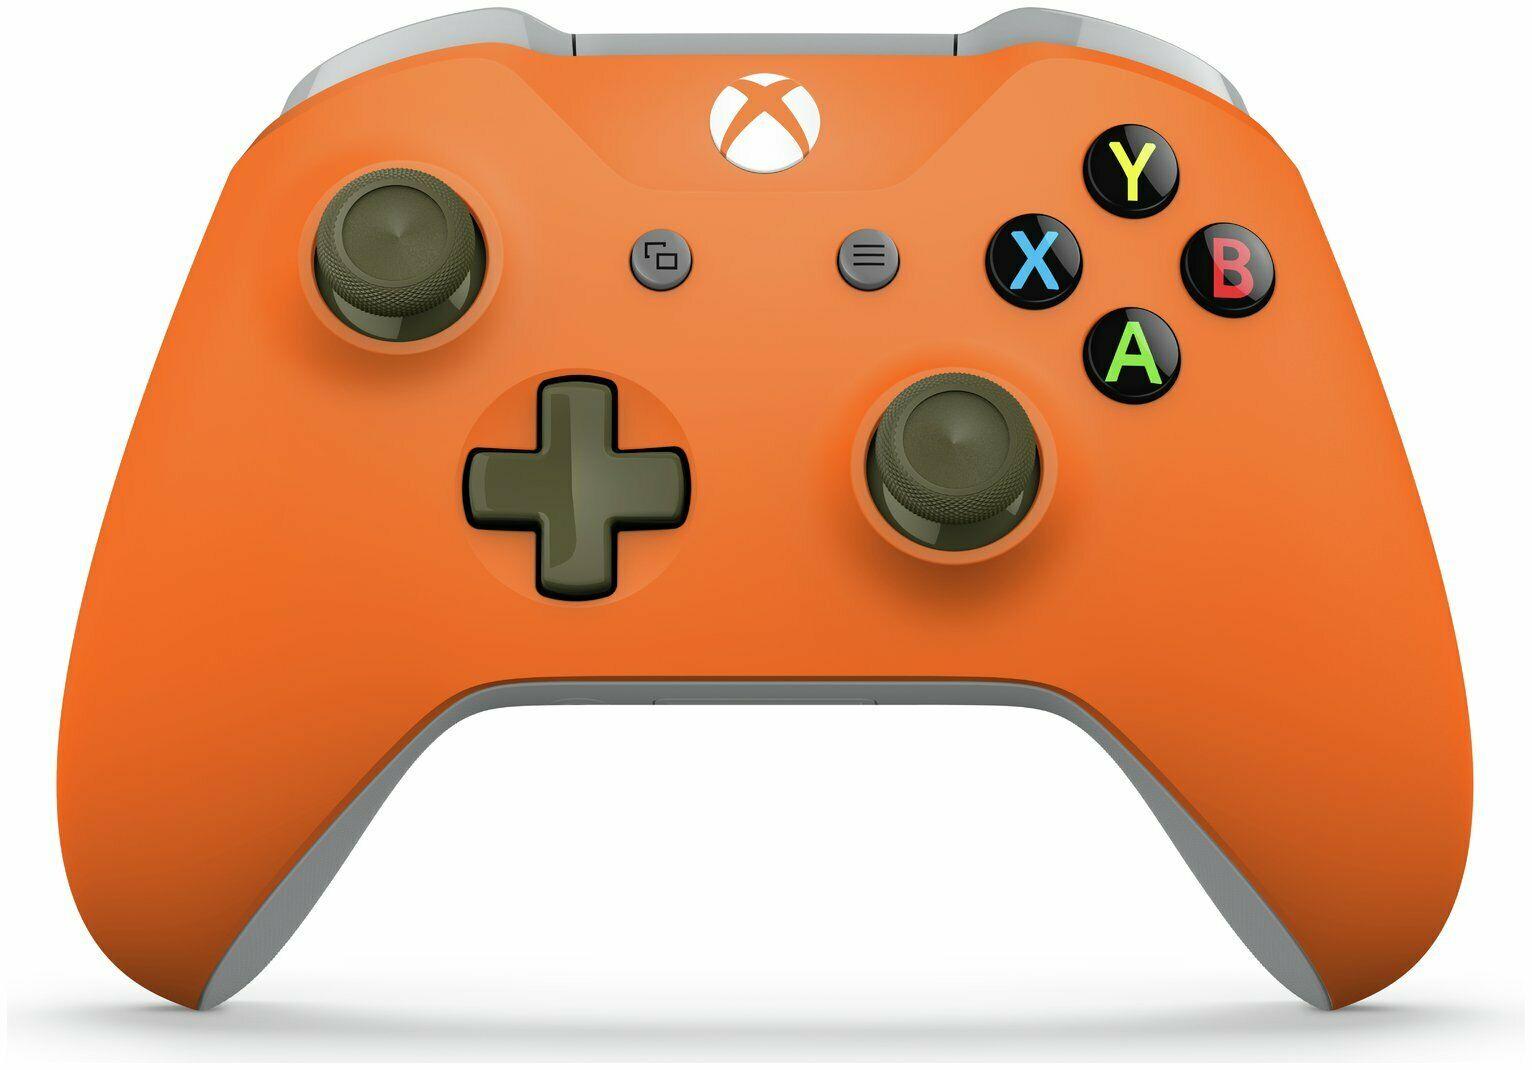 Xbox Wireless Controller - Zest Orange / Military Green £36.99 @ Argos eBay